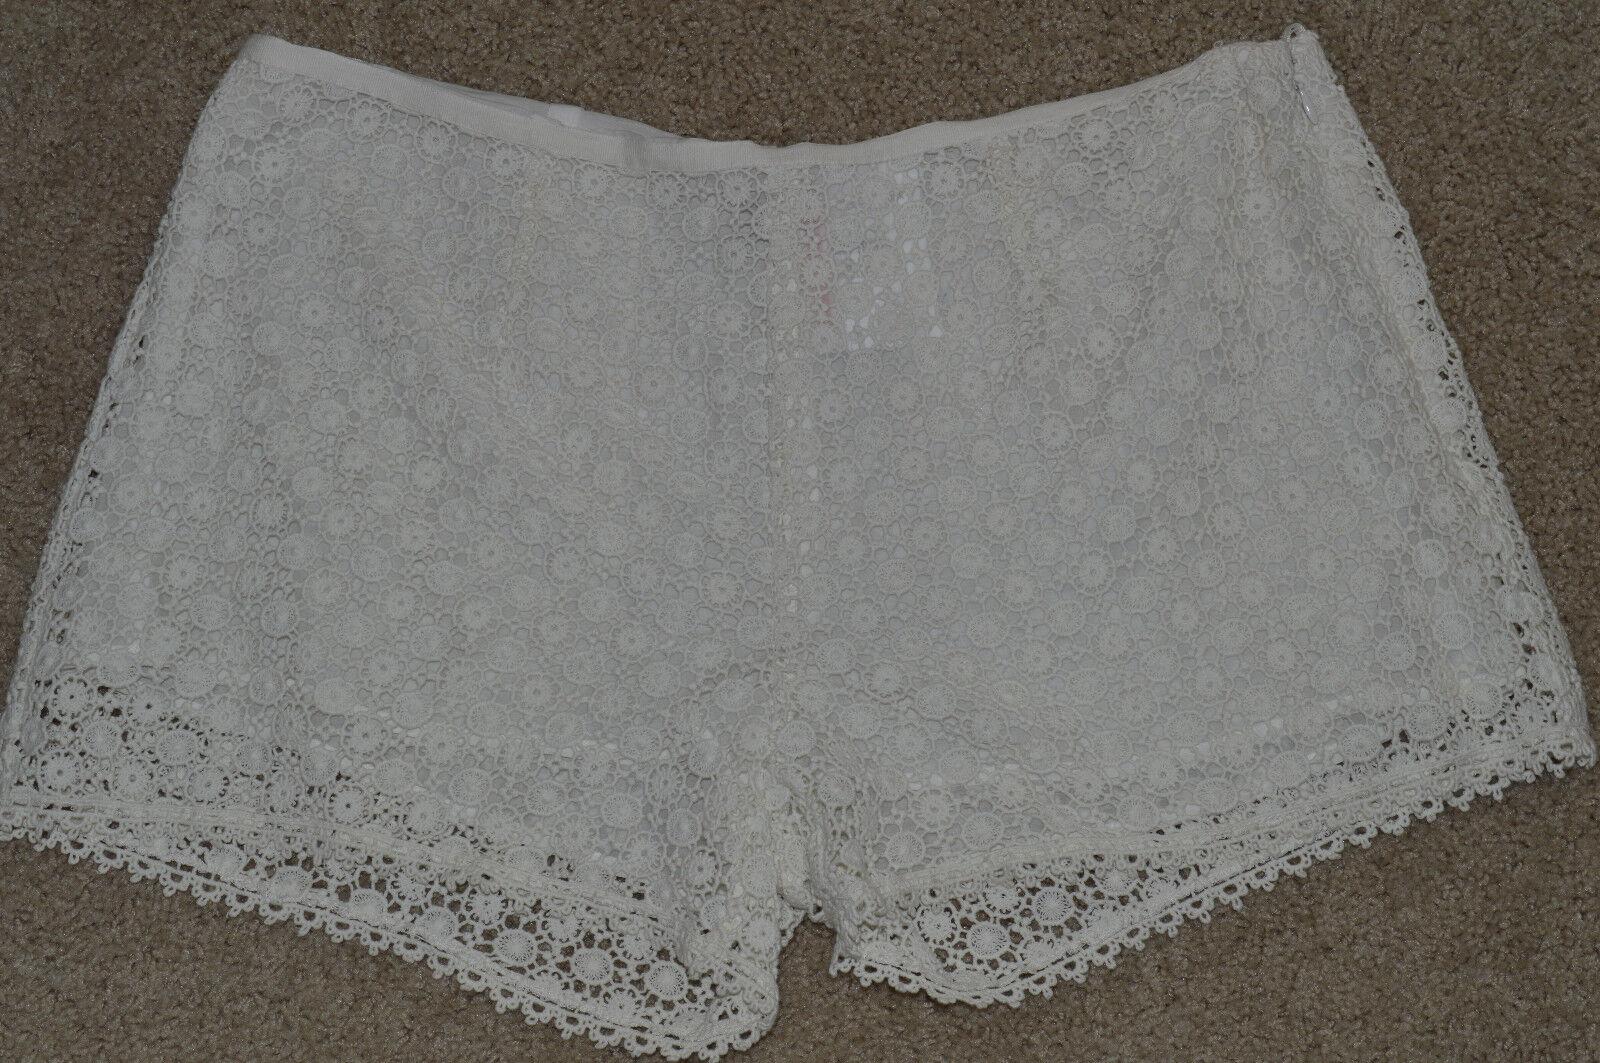 NEW JOIE Shorts Lace Crochet Lined Cream Beige Porcelain 10